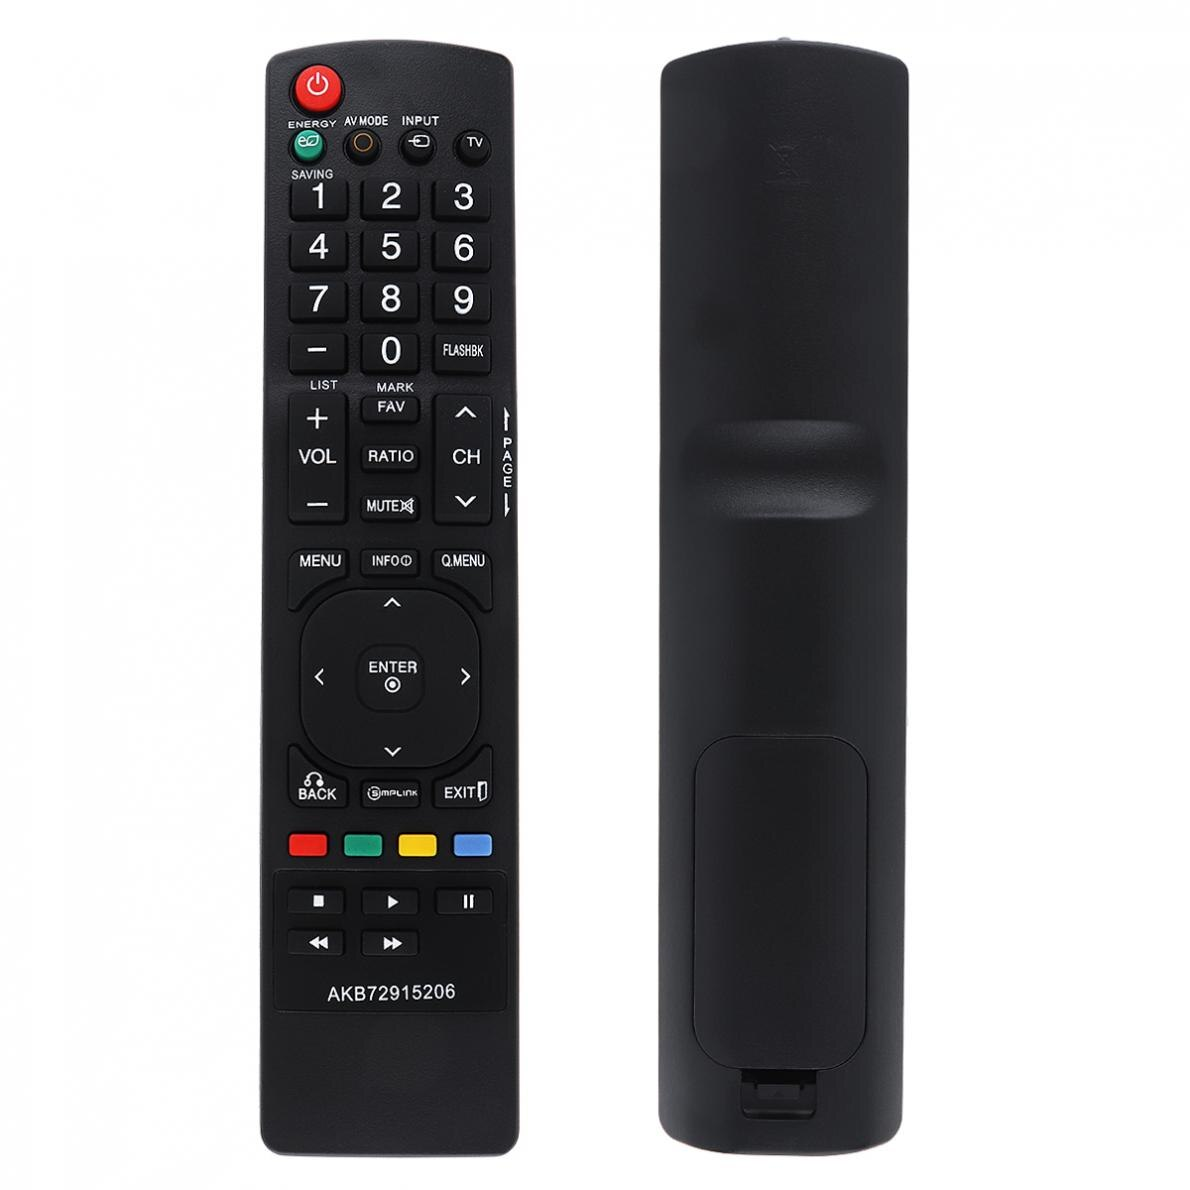 Negro 433MHZ IR Smart TV Control remoto adecuado para LG AKB72915206 / AKB73655806 / AKB72915266 TV batería no está incluida